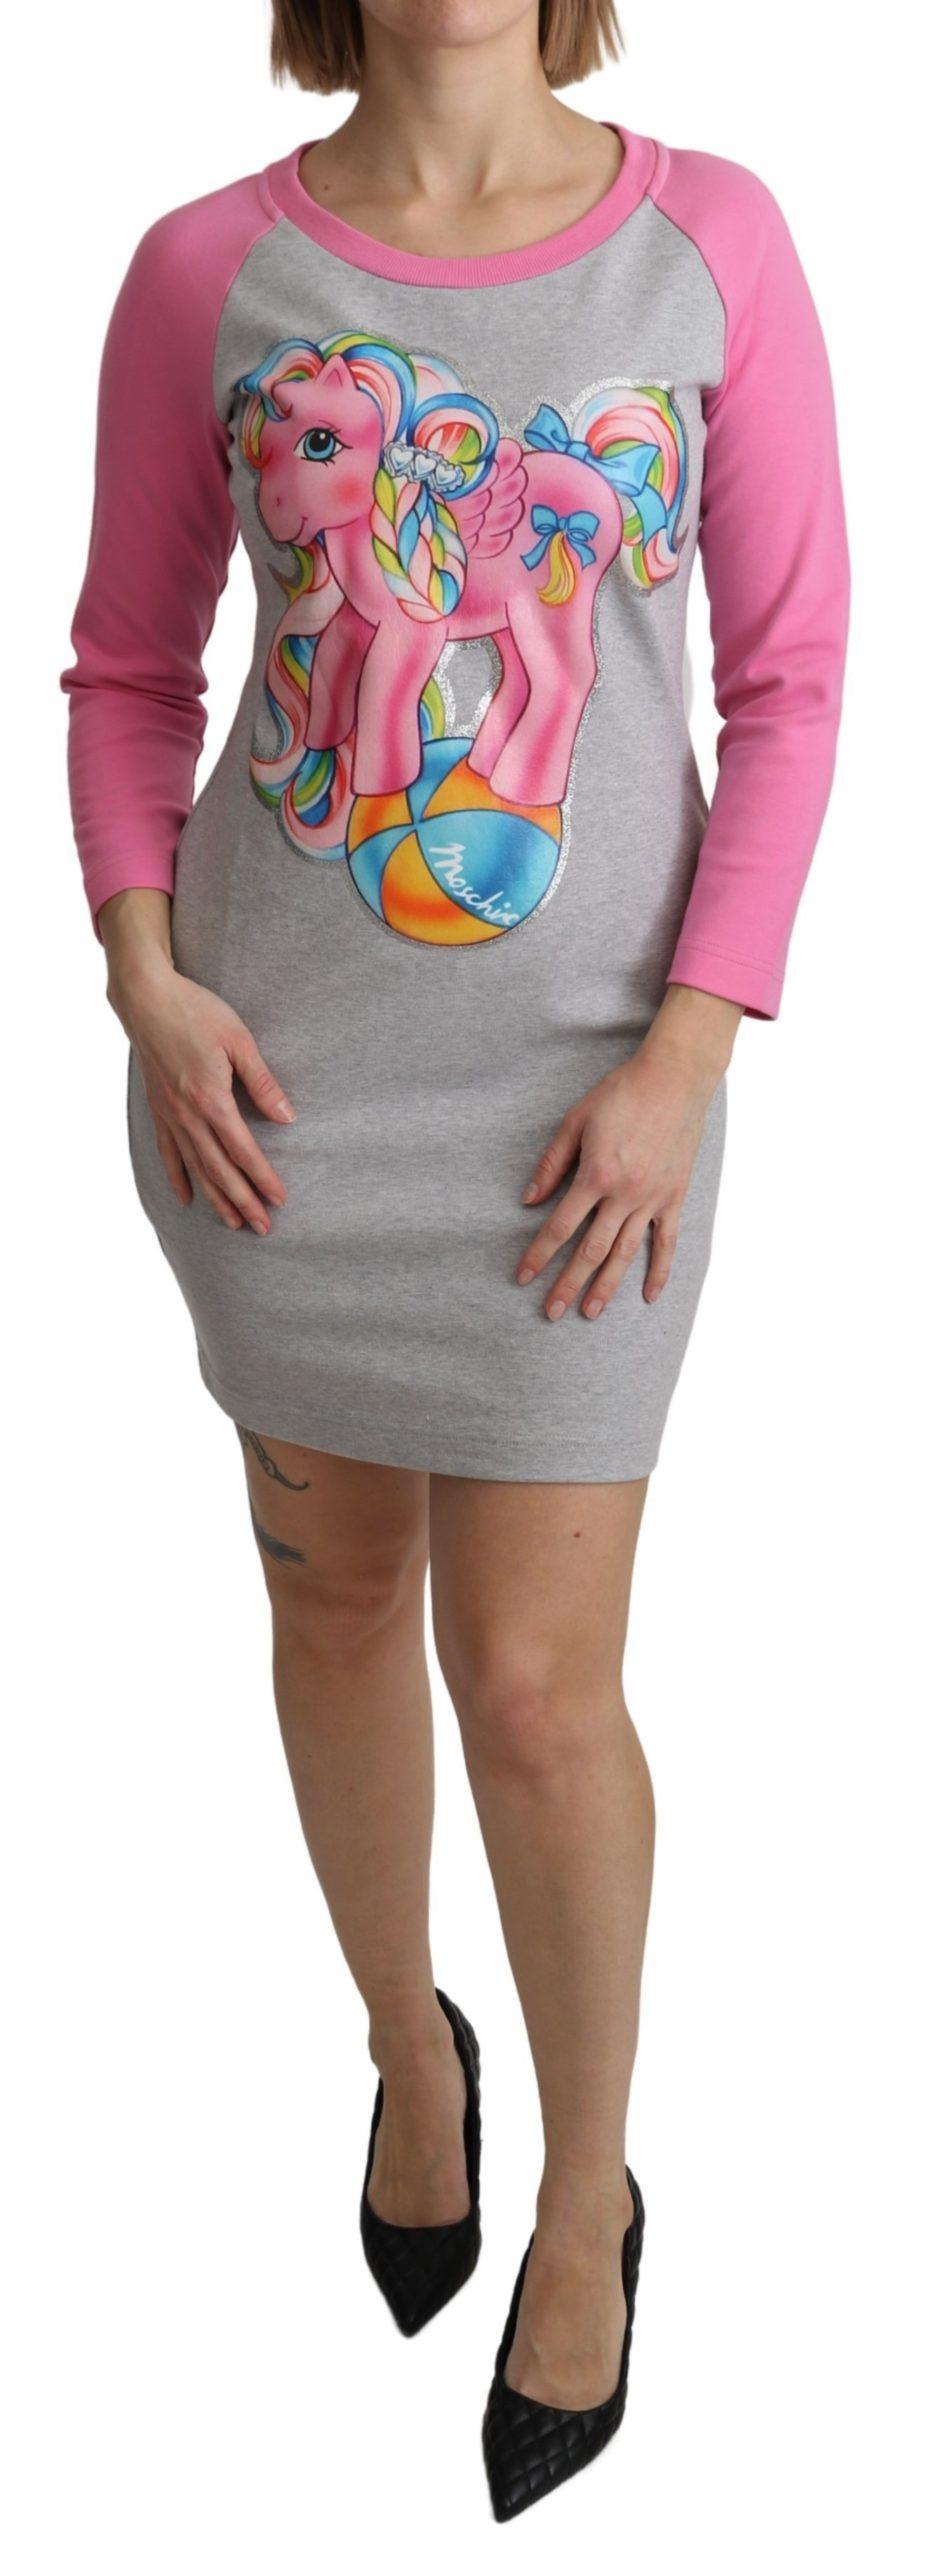 Moschino Women's My Little Pony Top Dress Multicolor TSH5087 - IT36 | XS